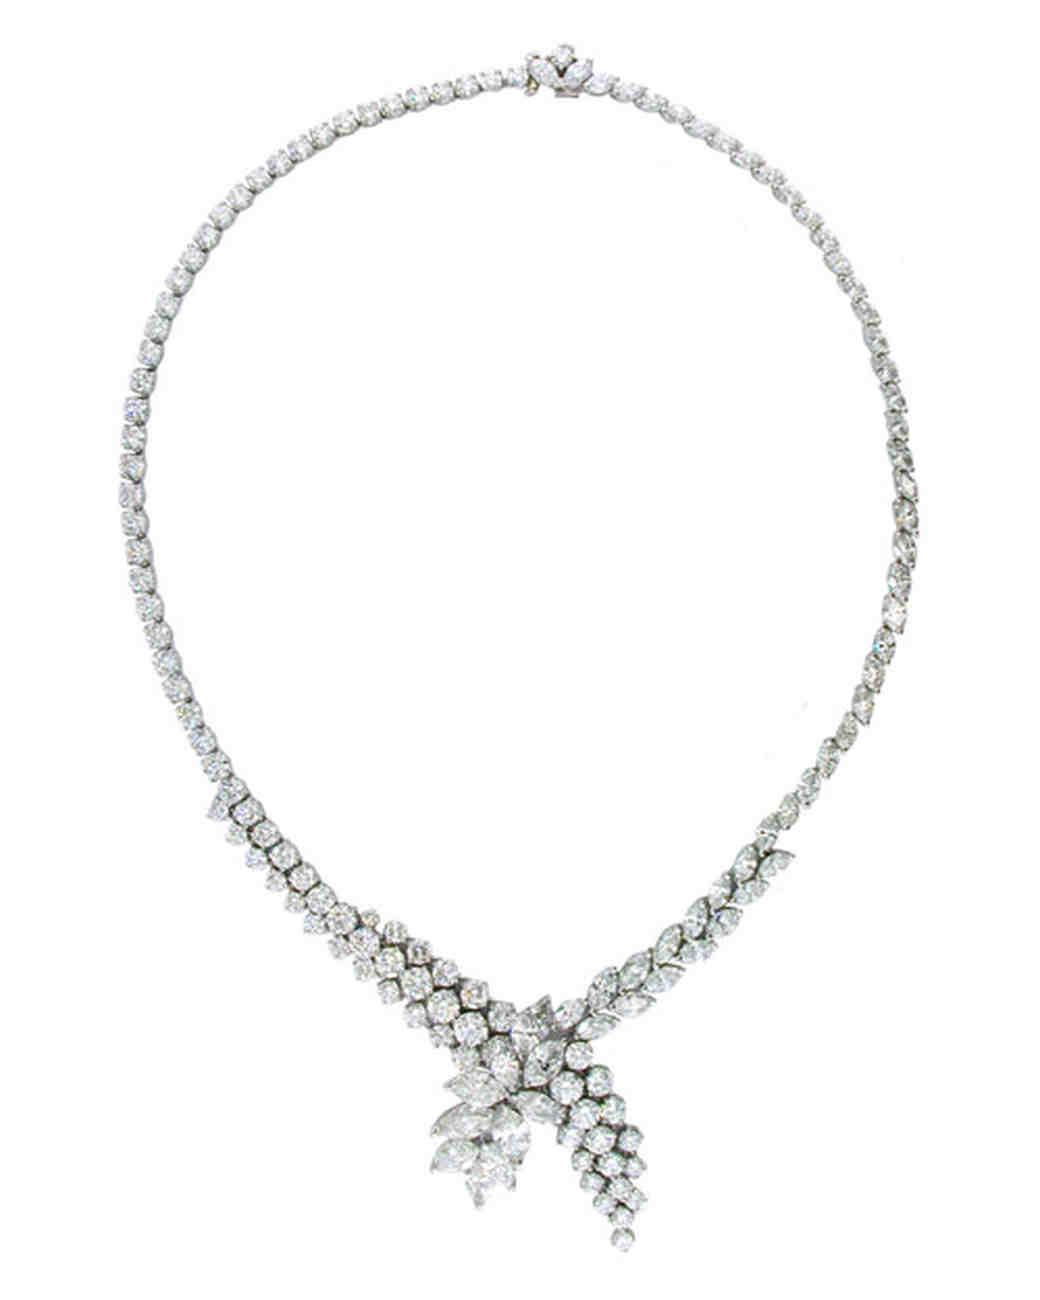 heyman_ohb_601688_plat_dia_necklace.jpg